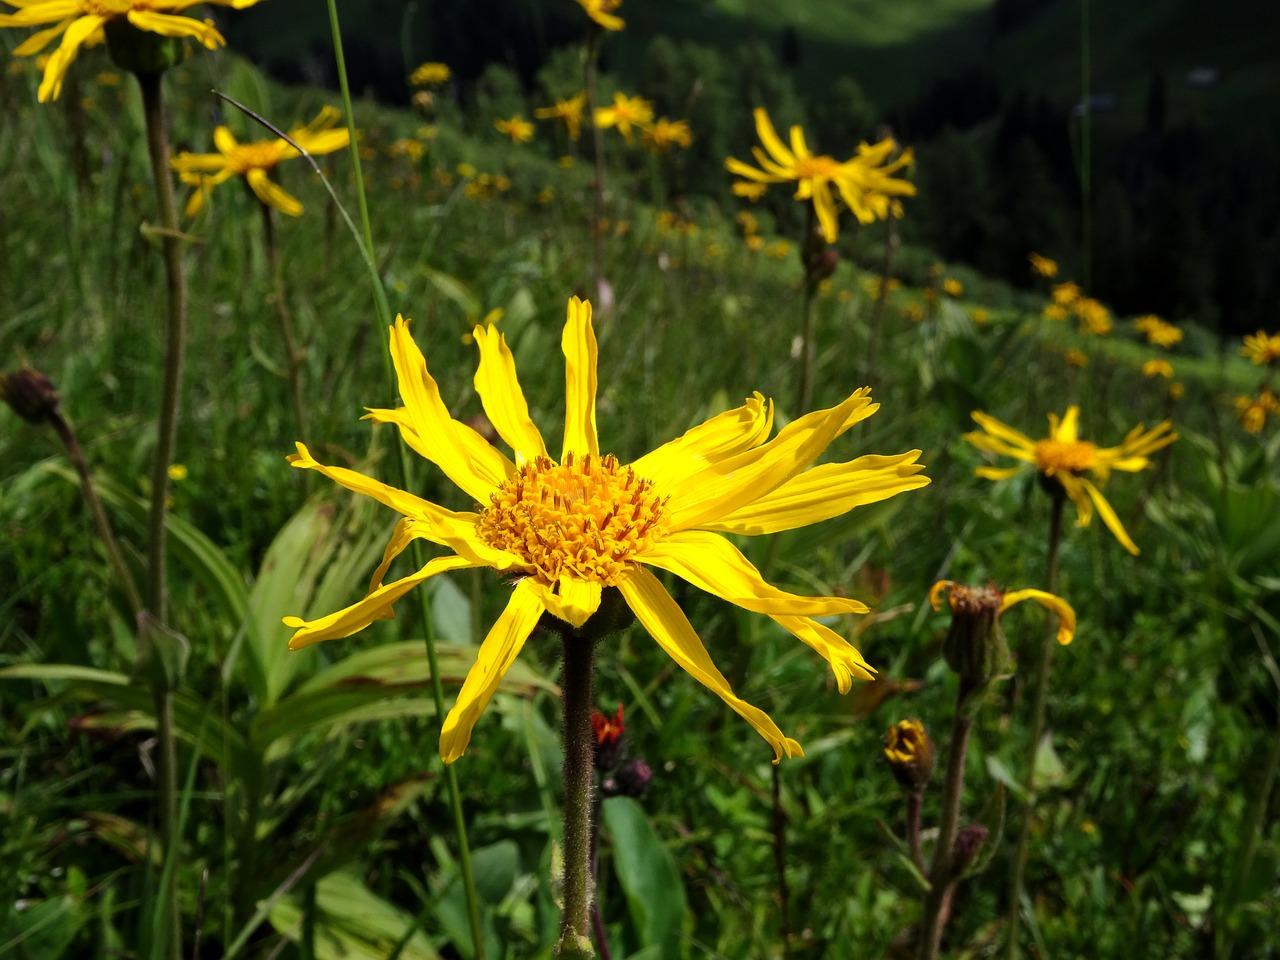 Arnicaarnica Montanamountain Well To Hireyellowmedicinal Plant